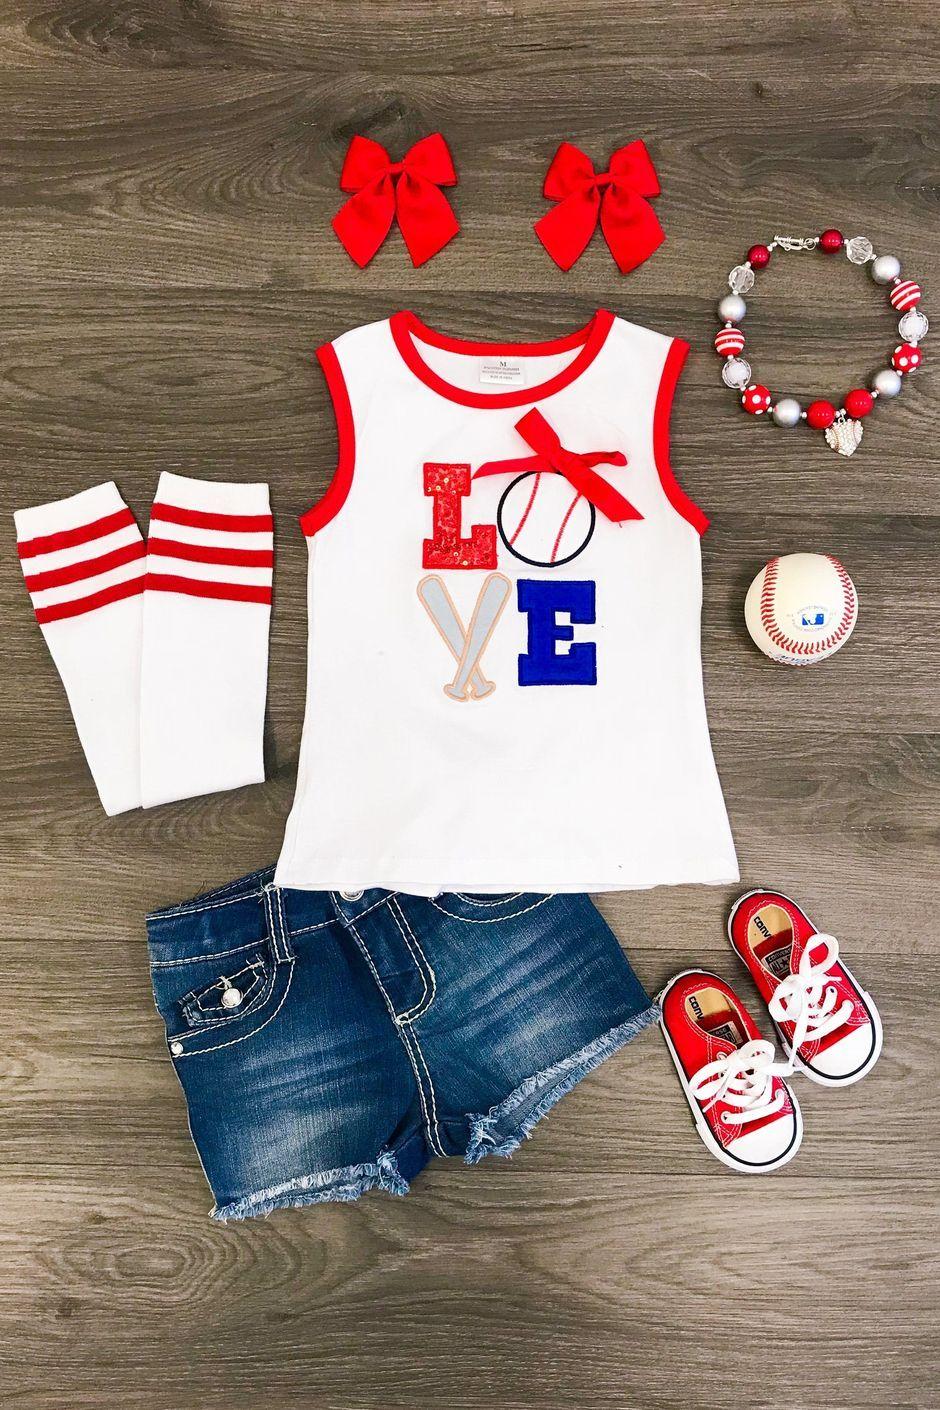 Springsummer mystery boxes girls baseball outfit baby